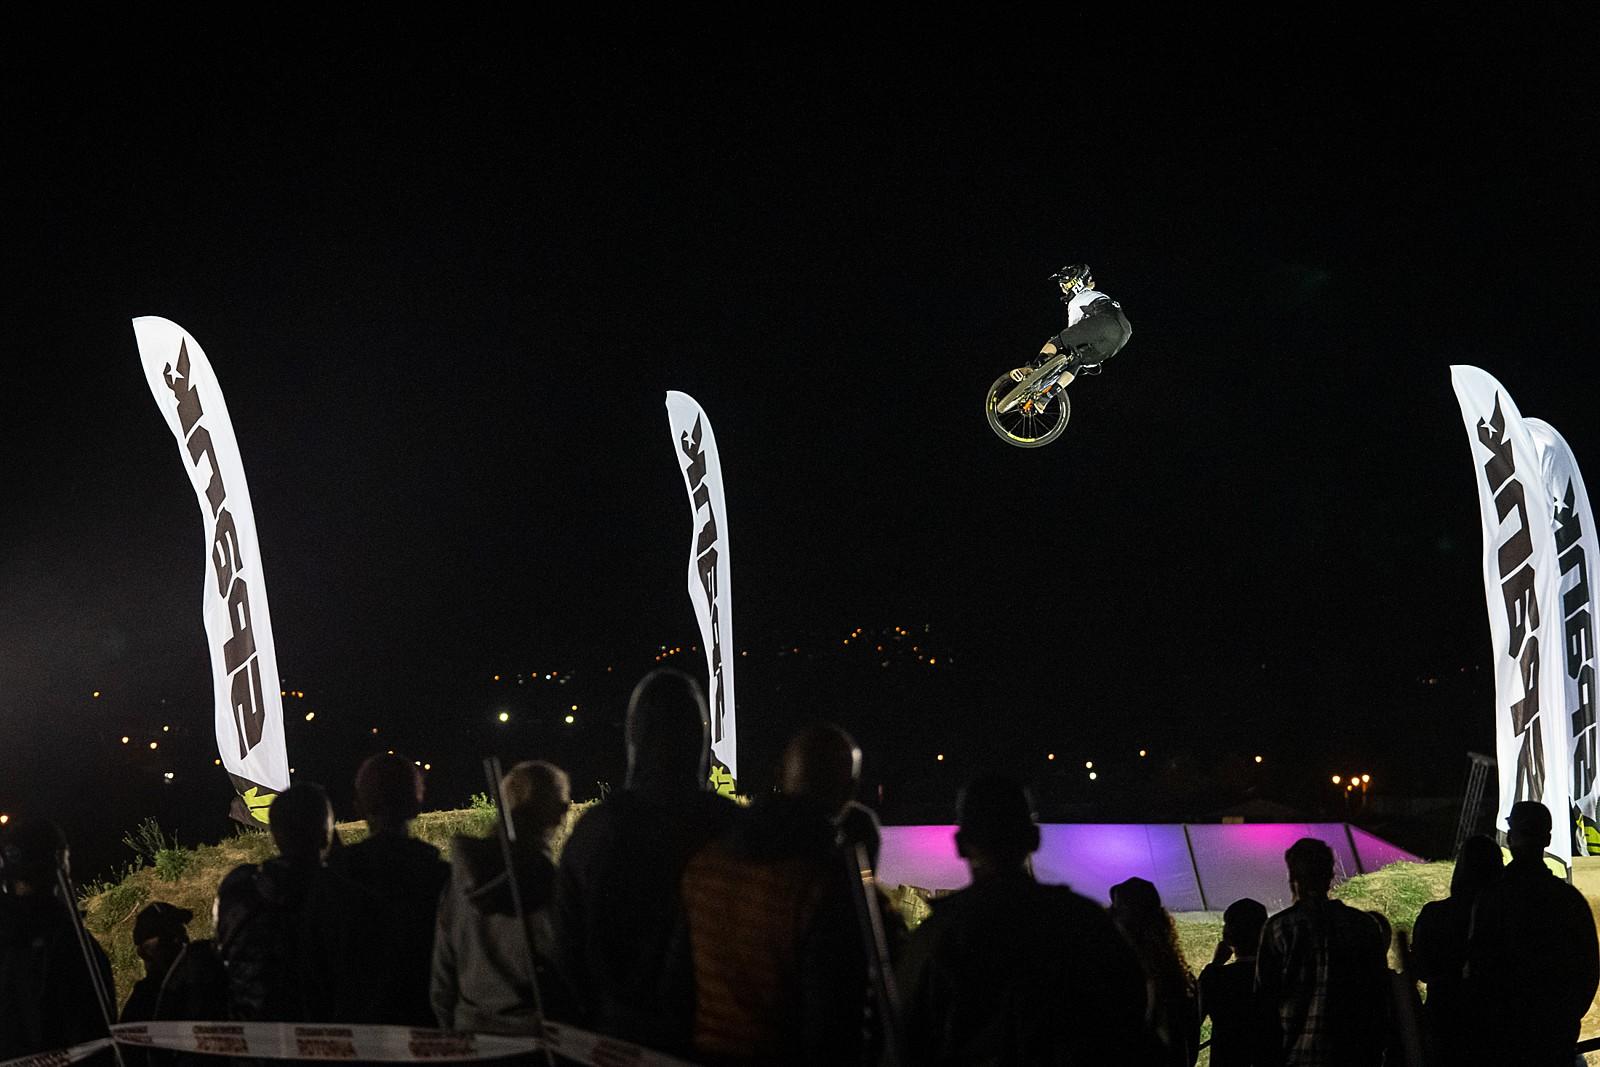 Crankworx NZ Whipoff 2020 - Crankworx New Zealand Whip-Off Photo Gallery - Mountain Biking Pictures - Vital MTB